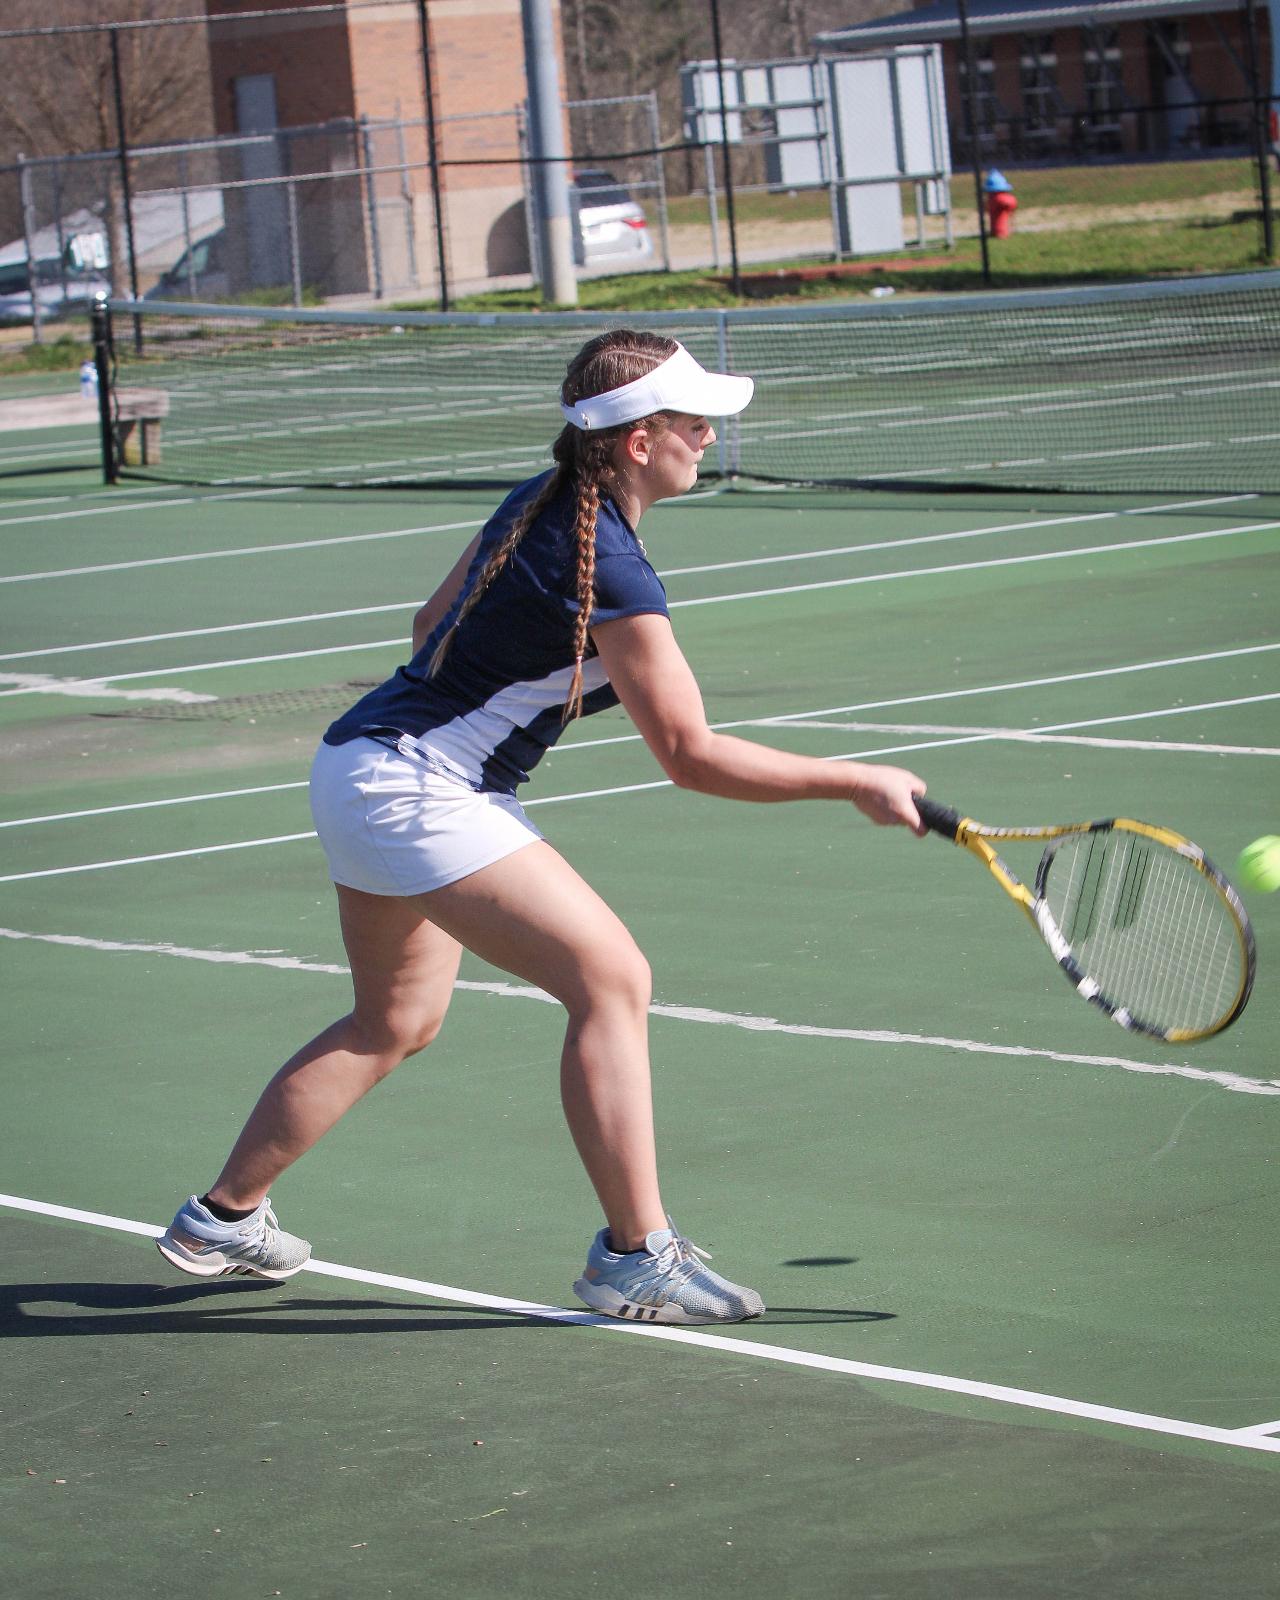 GIRLS TENNIS: Bethany Underwood wins at Heritage